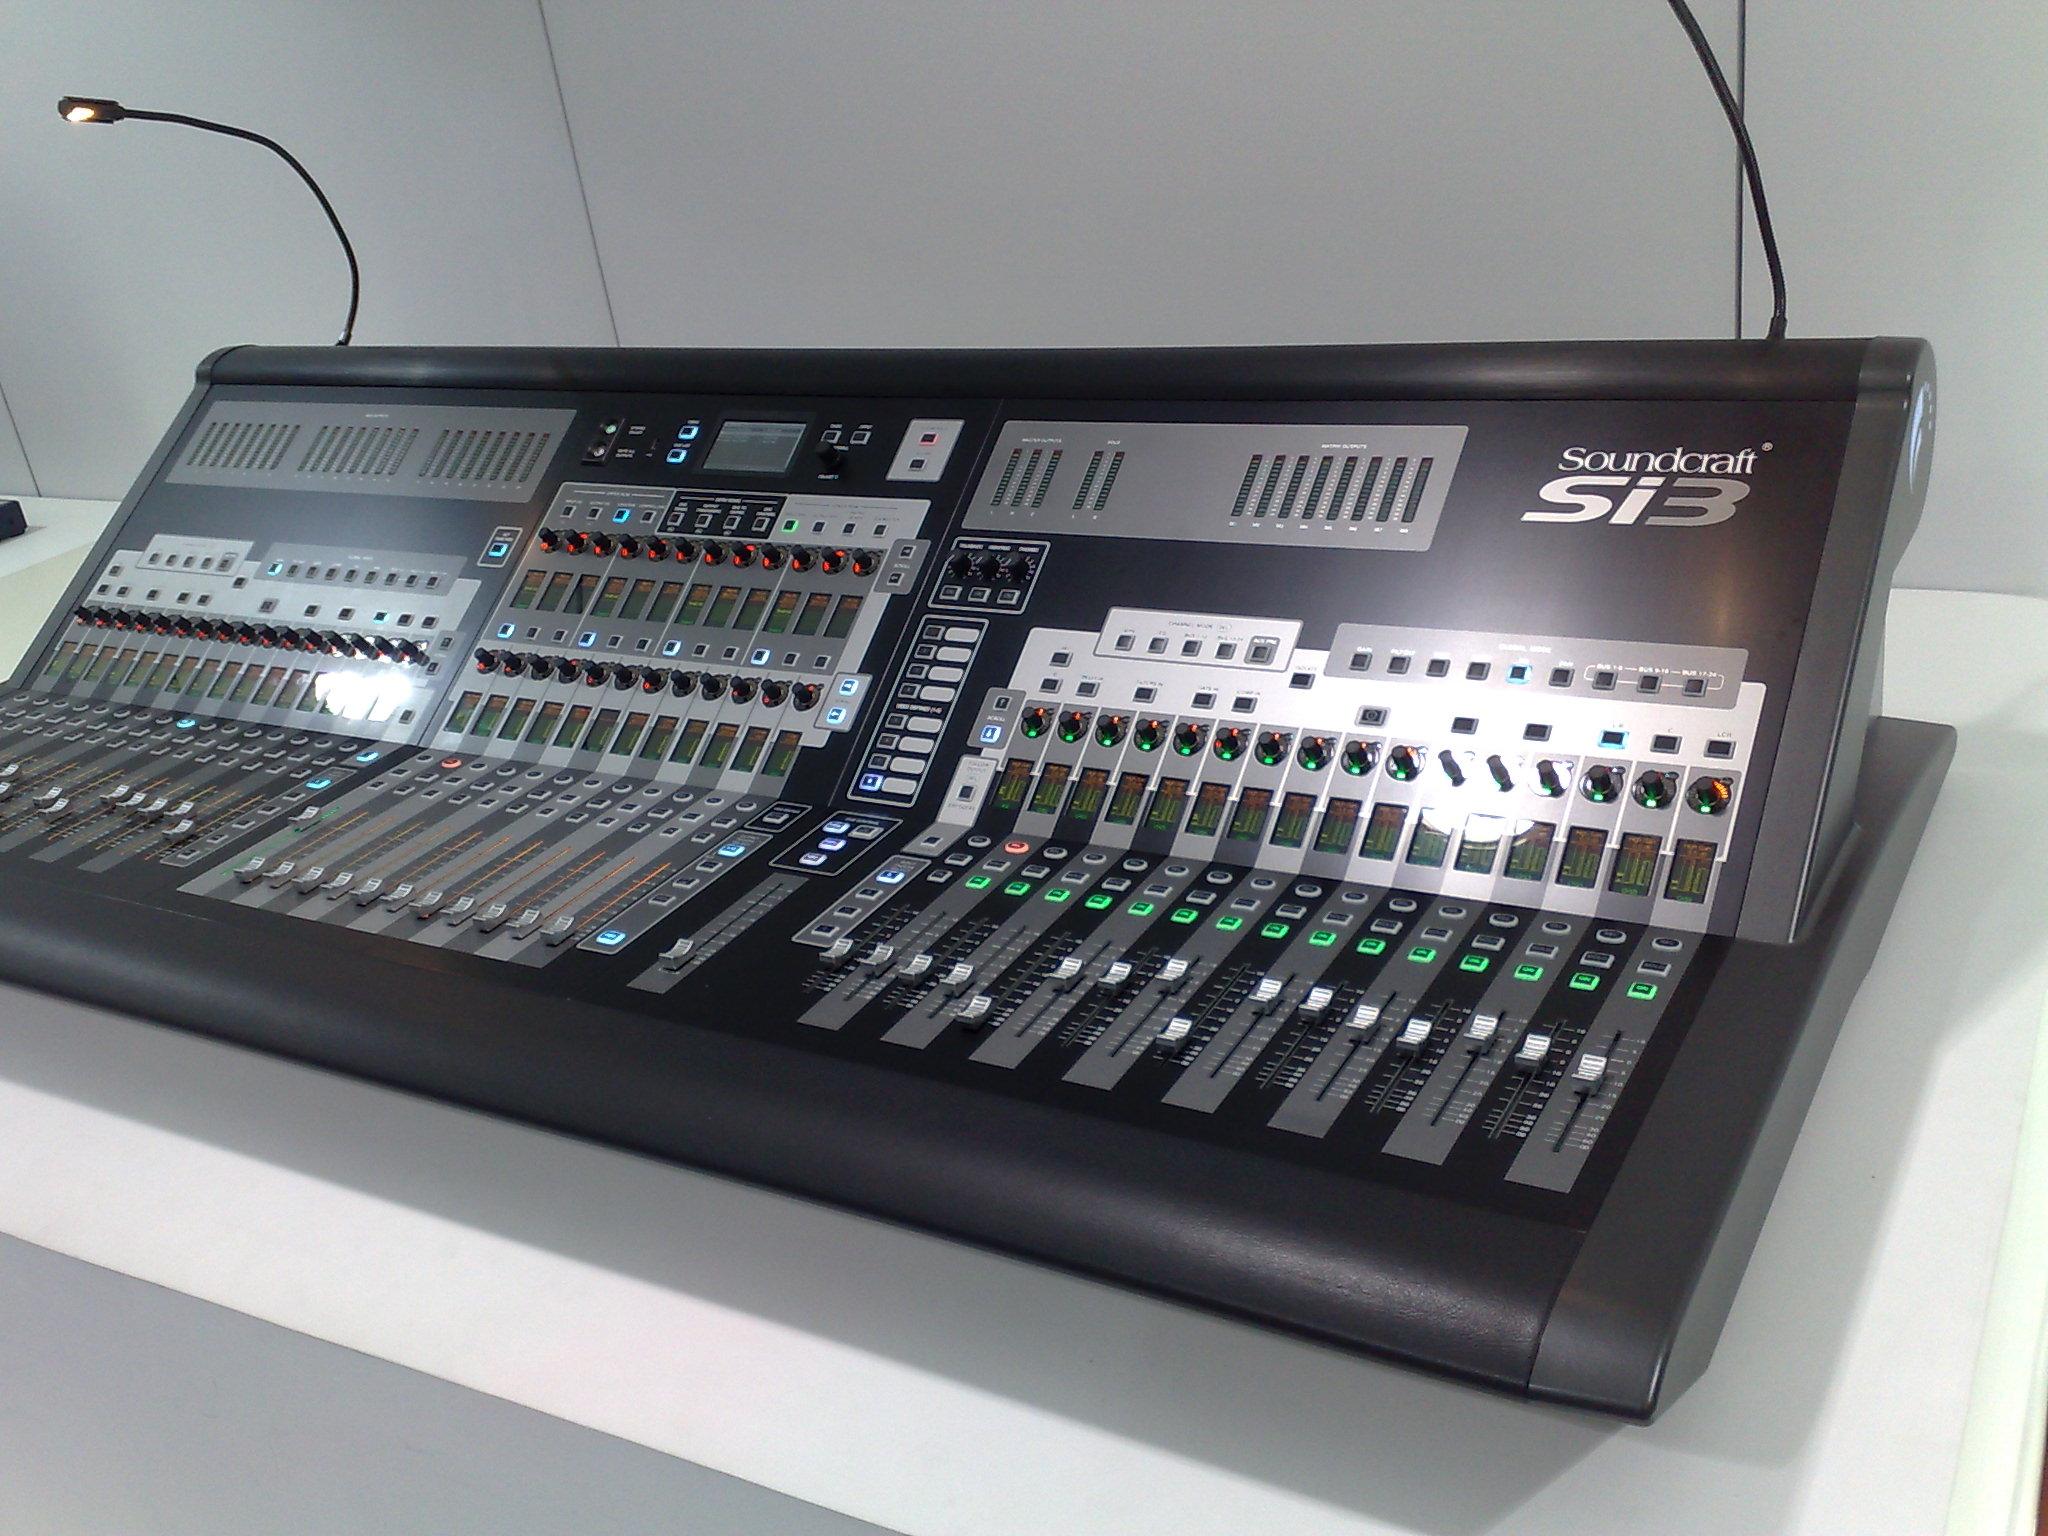 File:Soundcraft Si3, Expomusic 2010.jpg - Wikimedia Commons